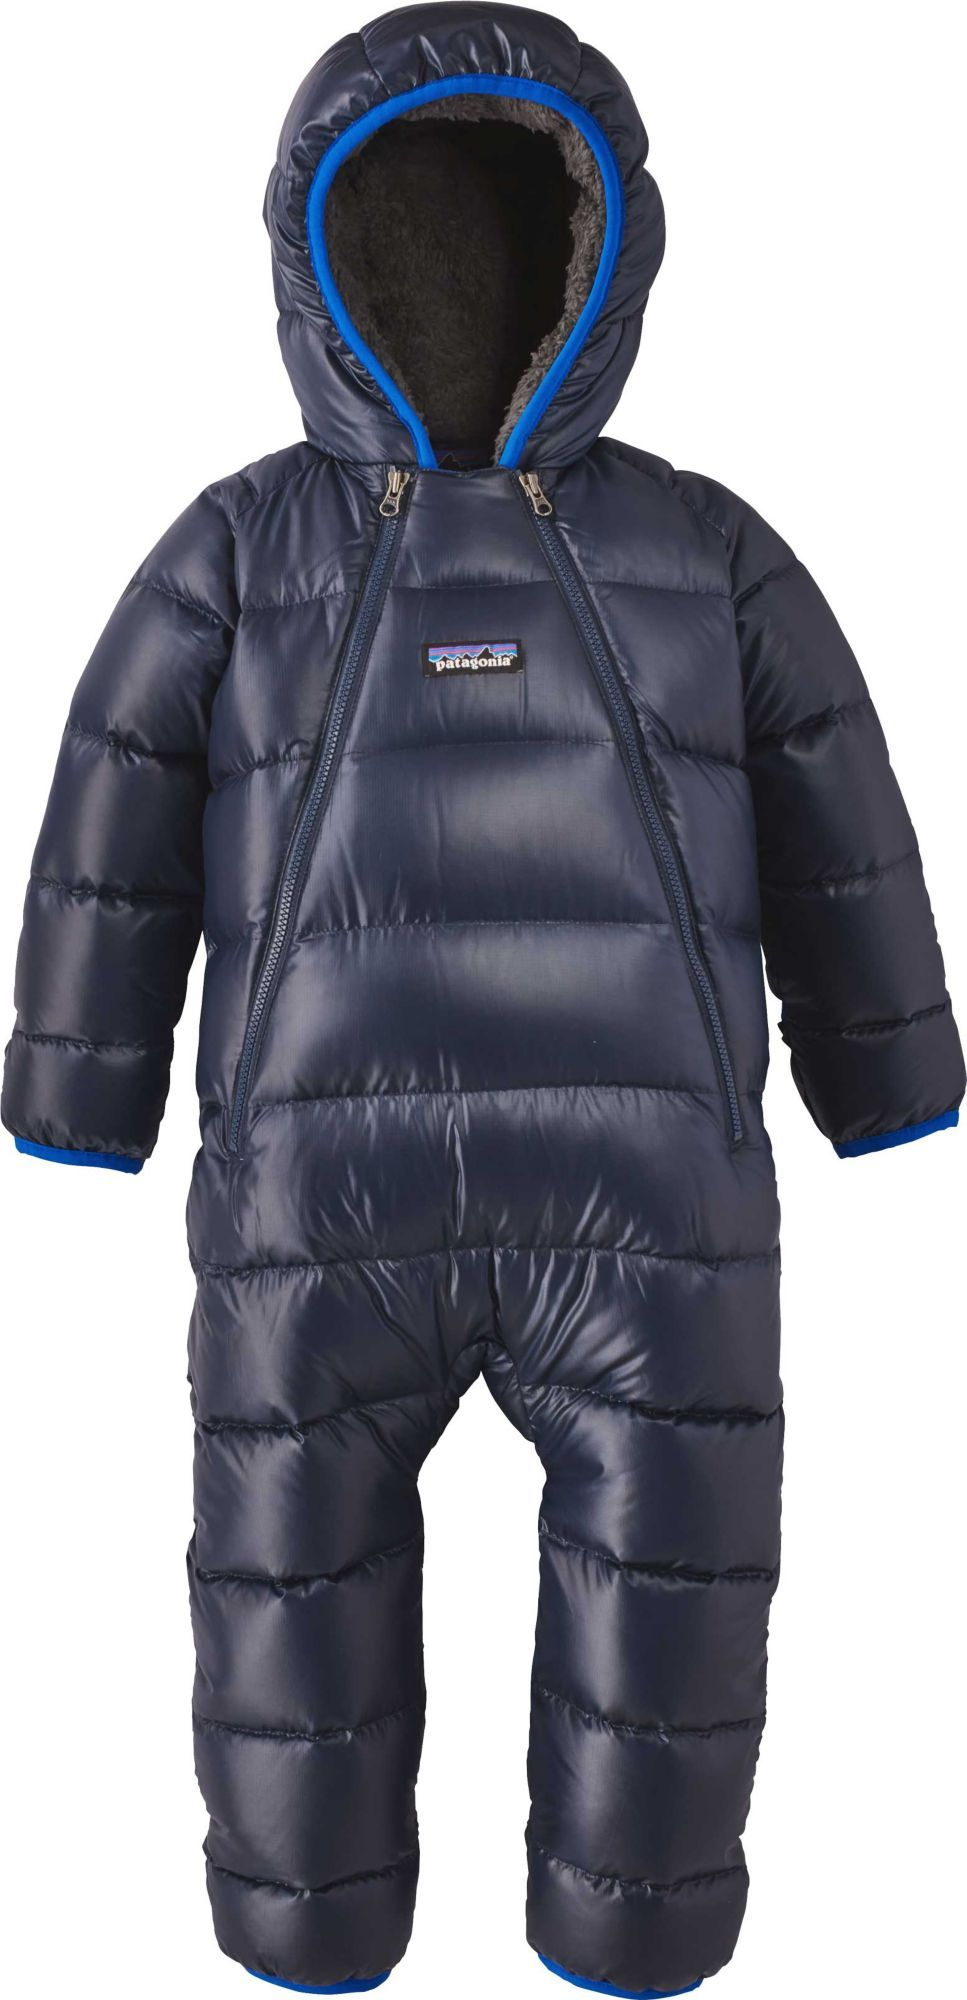 c795b2490 Patagonia Infant Boys' Hi-Loft Down Sweater Bunting, Size: NB-7LBS, Blue